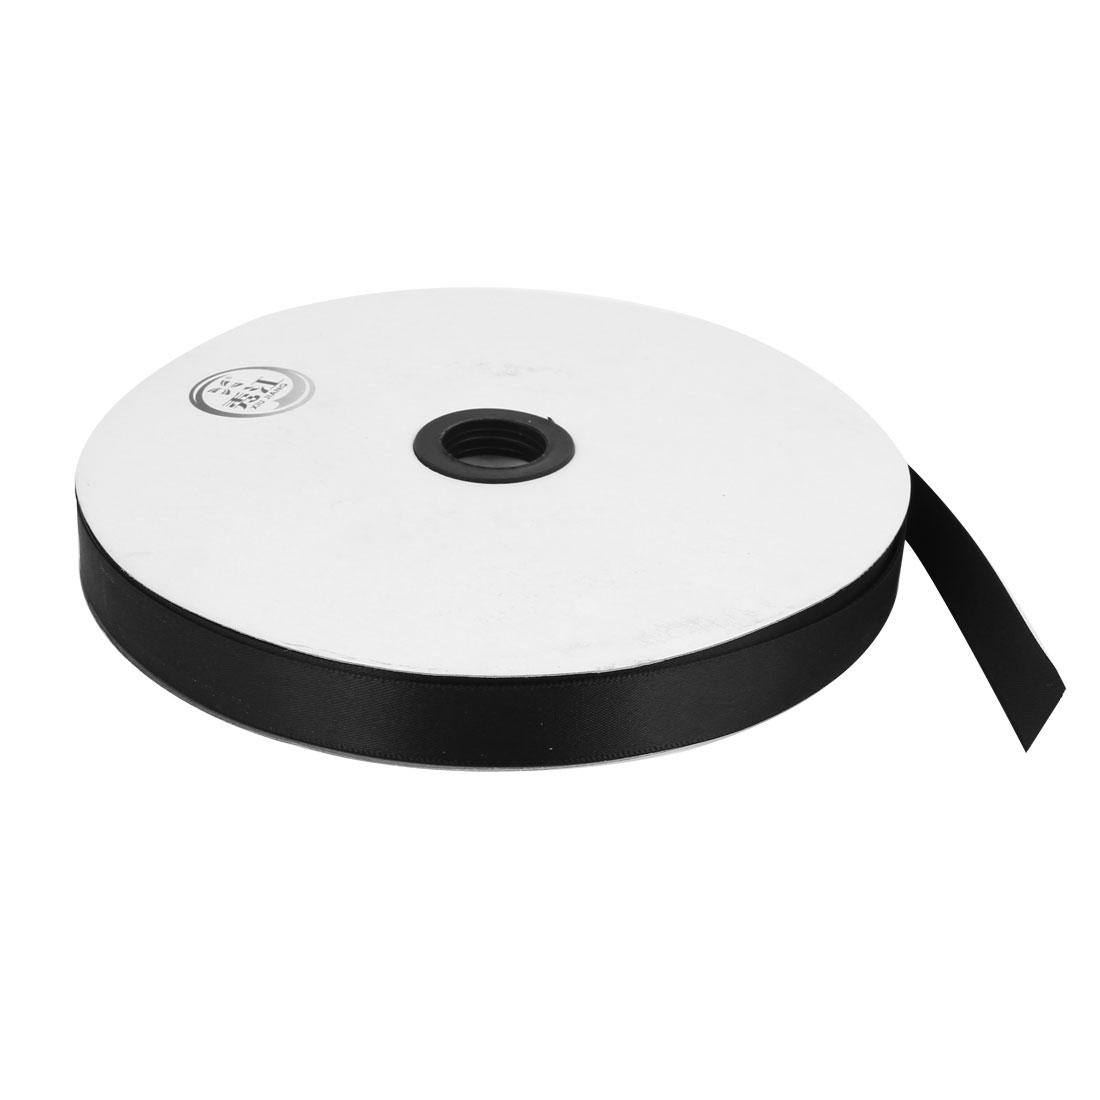 Black 1.5cm Width DIY Craft Wedding Party Sewing Decor Ribbon Roll Tape 100 Yard 91m Length